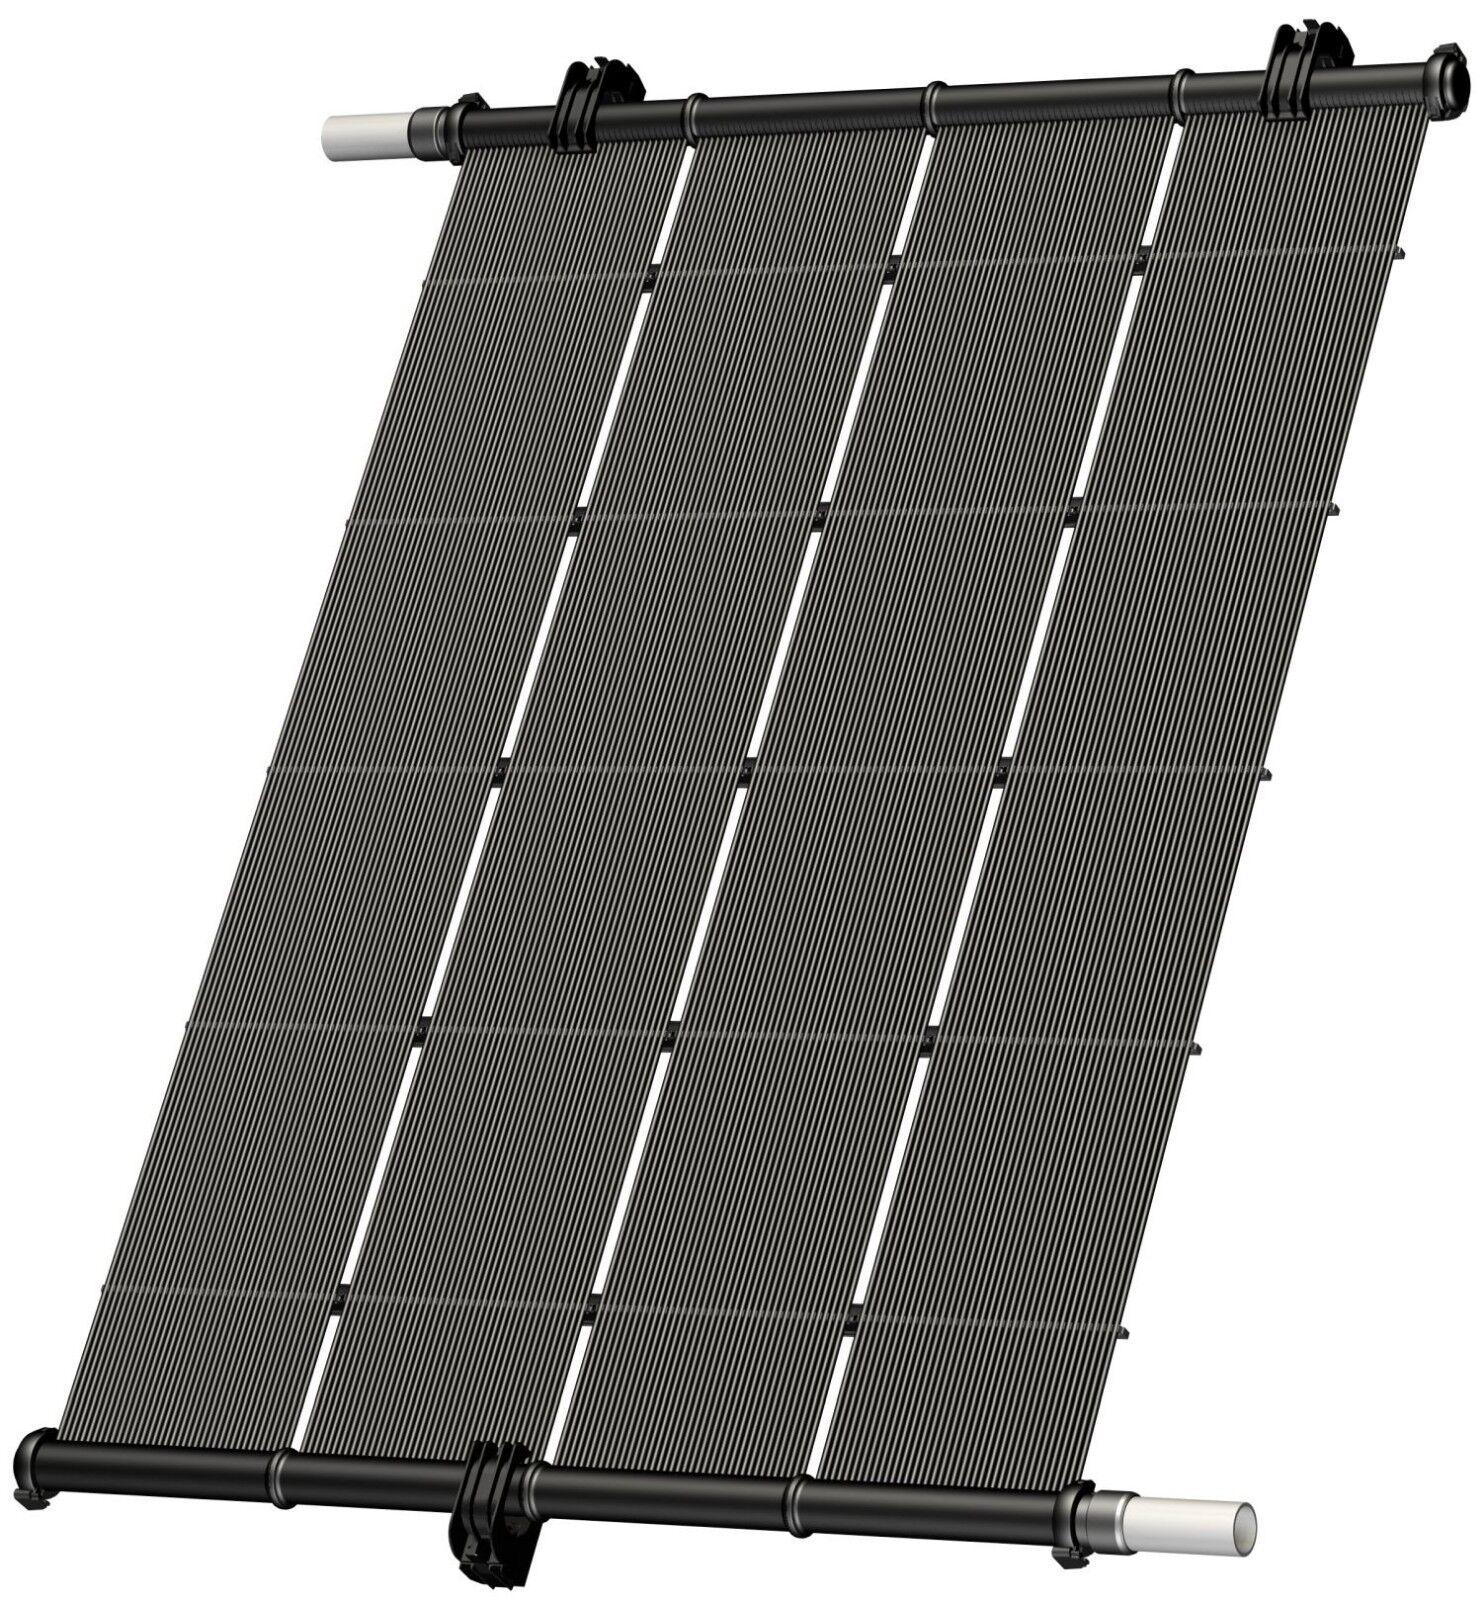 Profi Pool Schwimmbadheizung Solar Heizung Kollektor 8,31 m² (EUR 66,-- / m²)